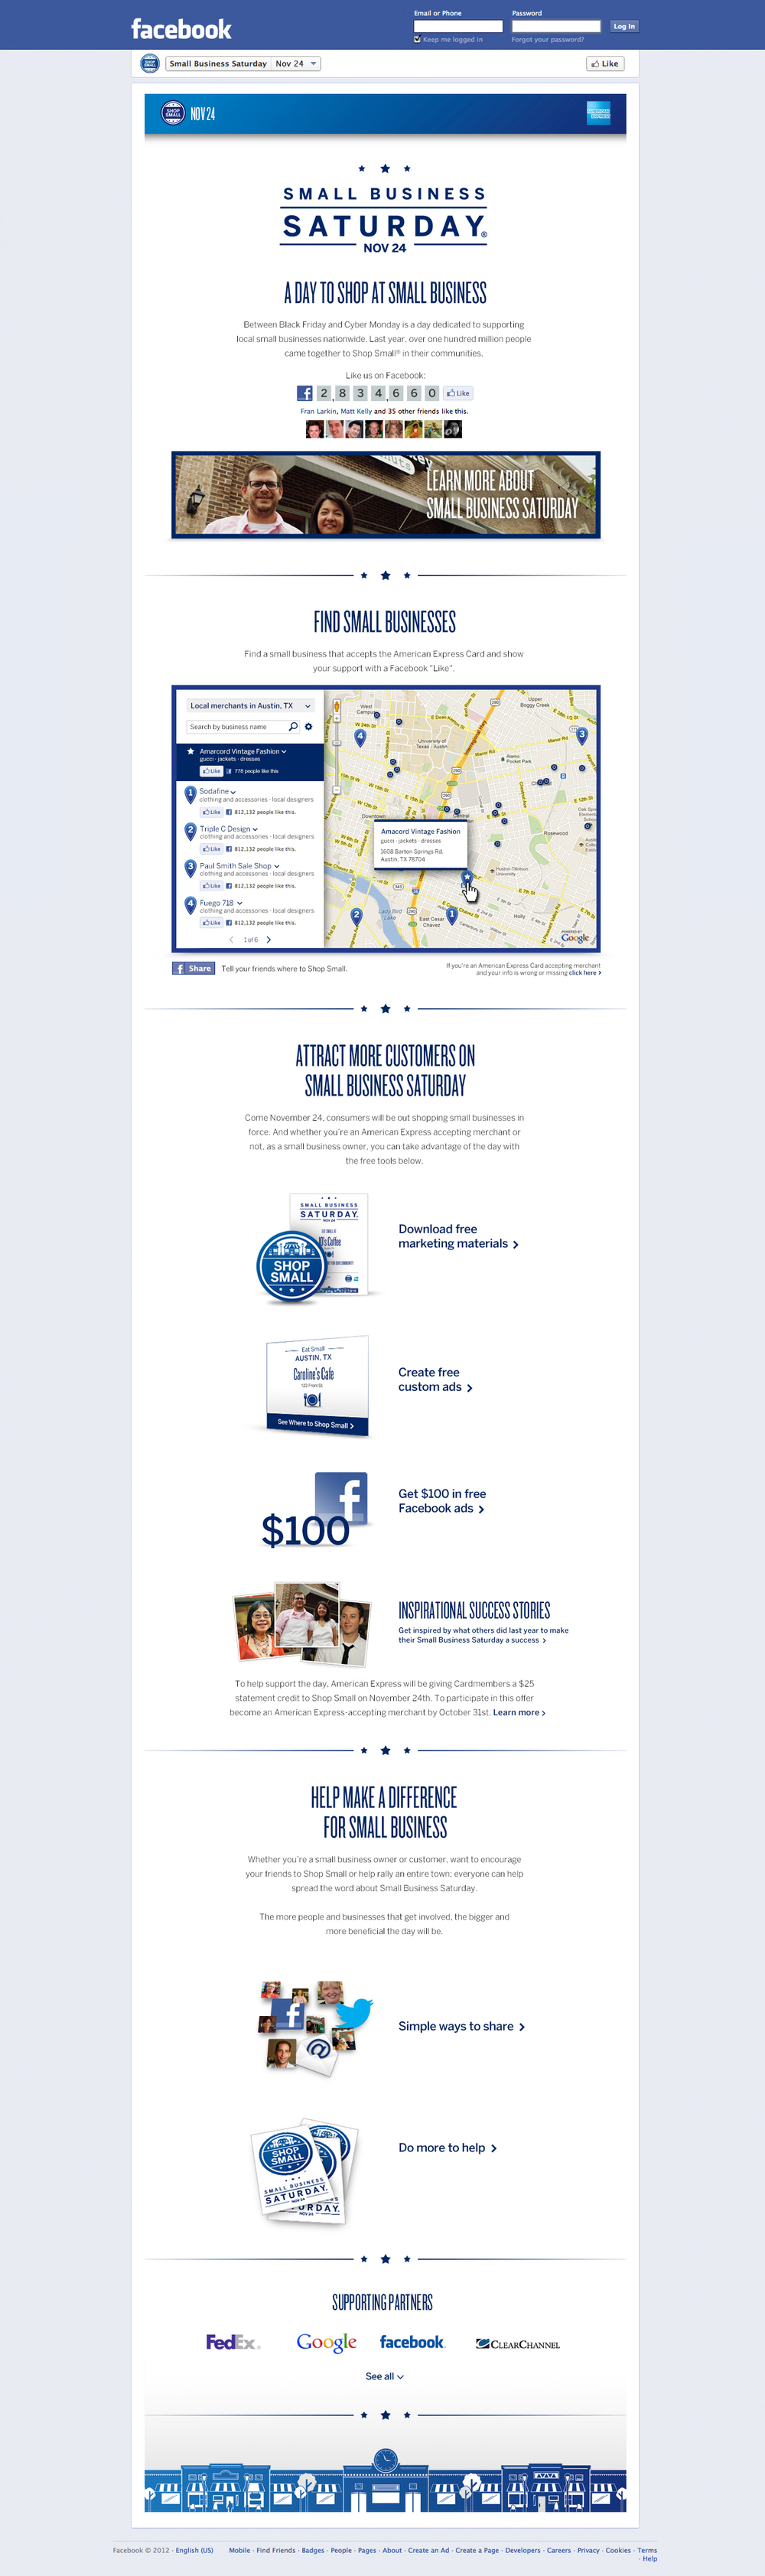 facebook_home.jpg